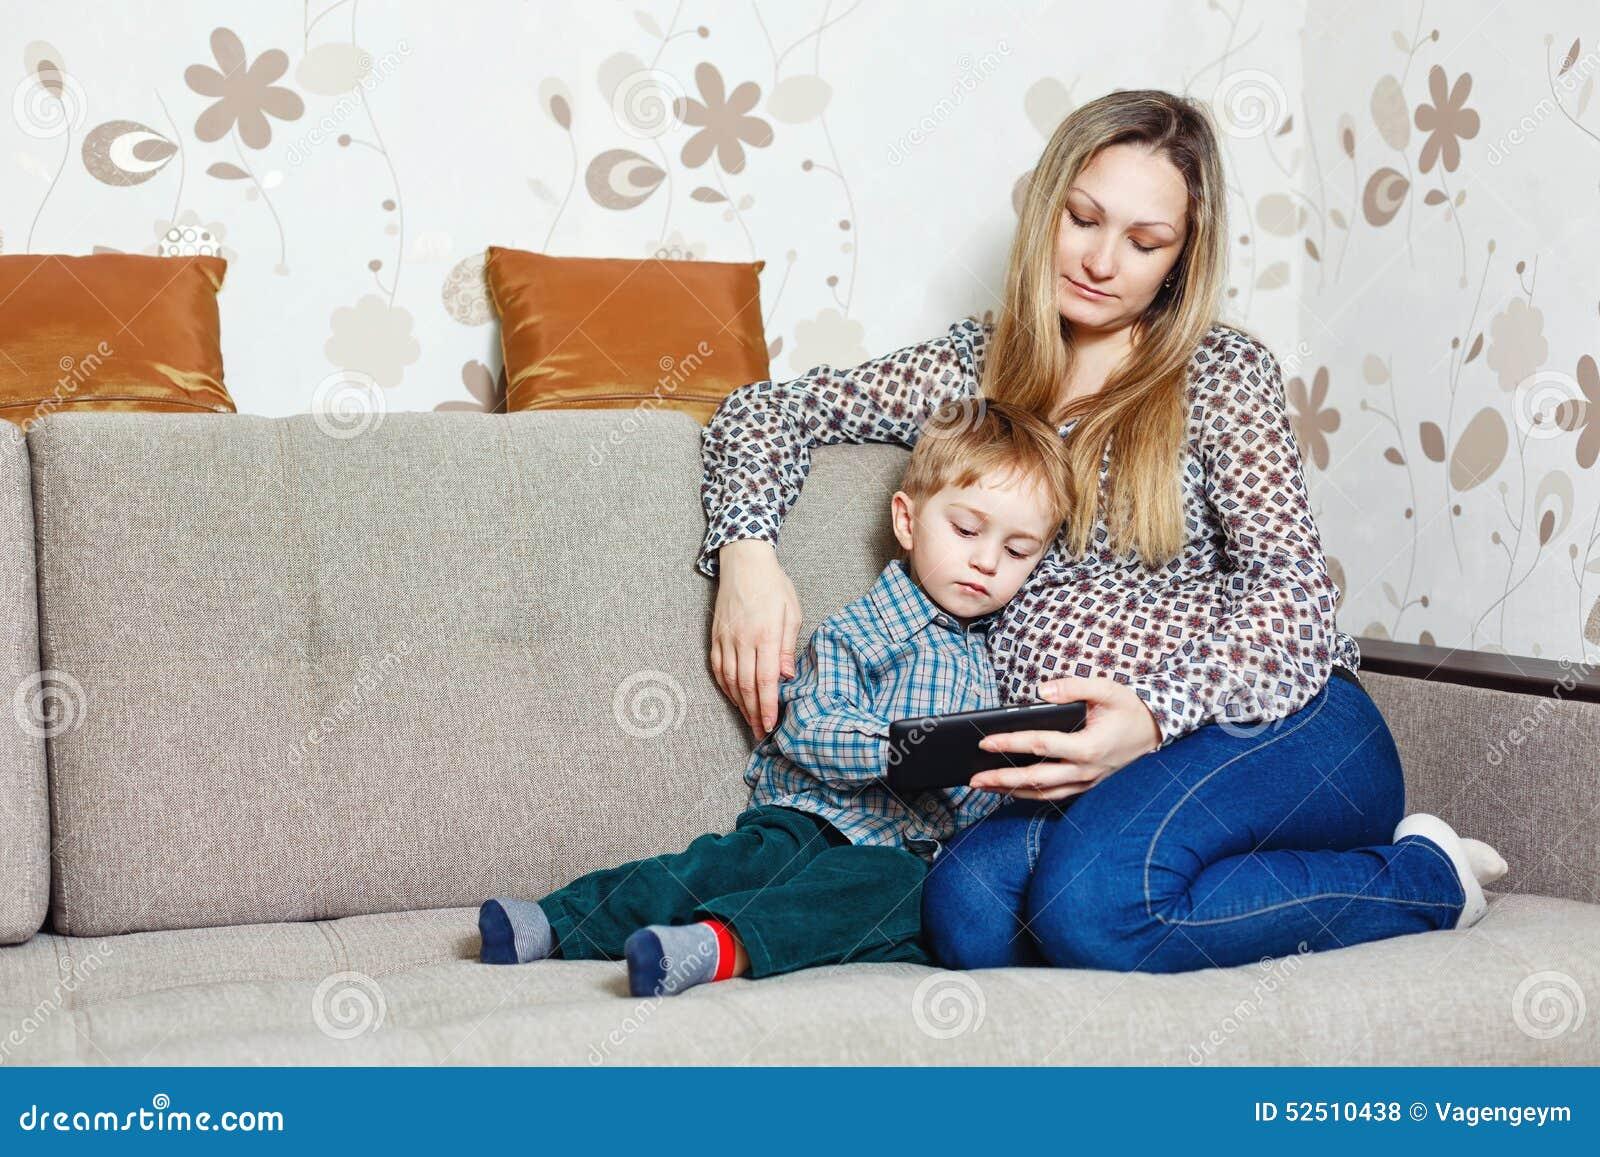 mom sitting on